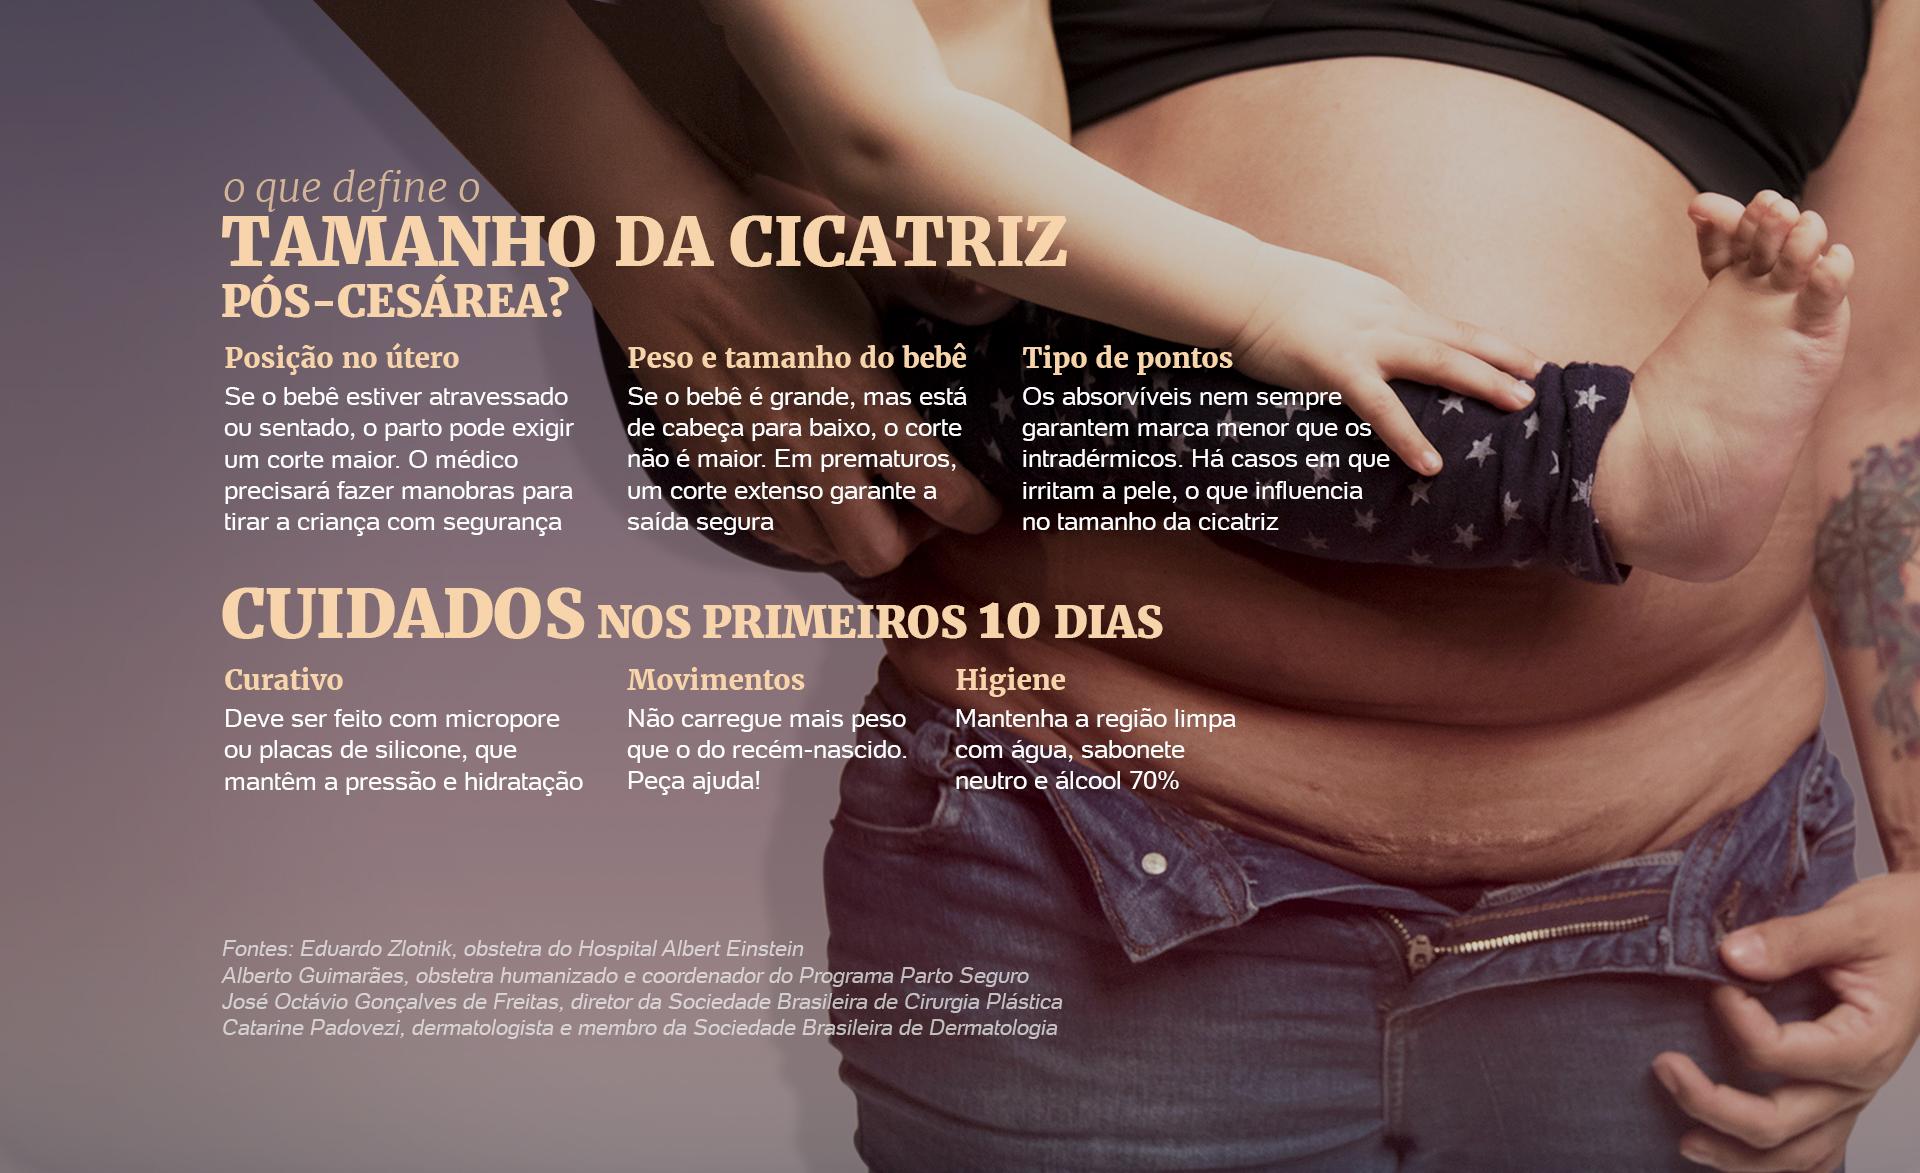 Bruna Sanches/UOL